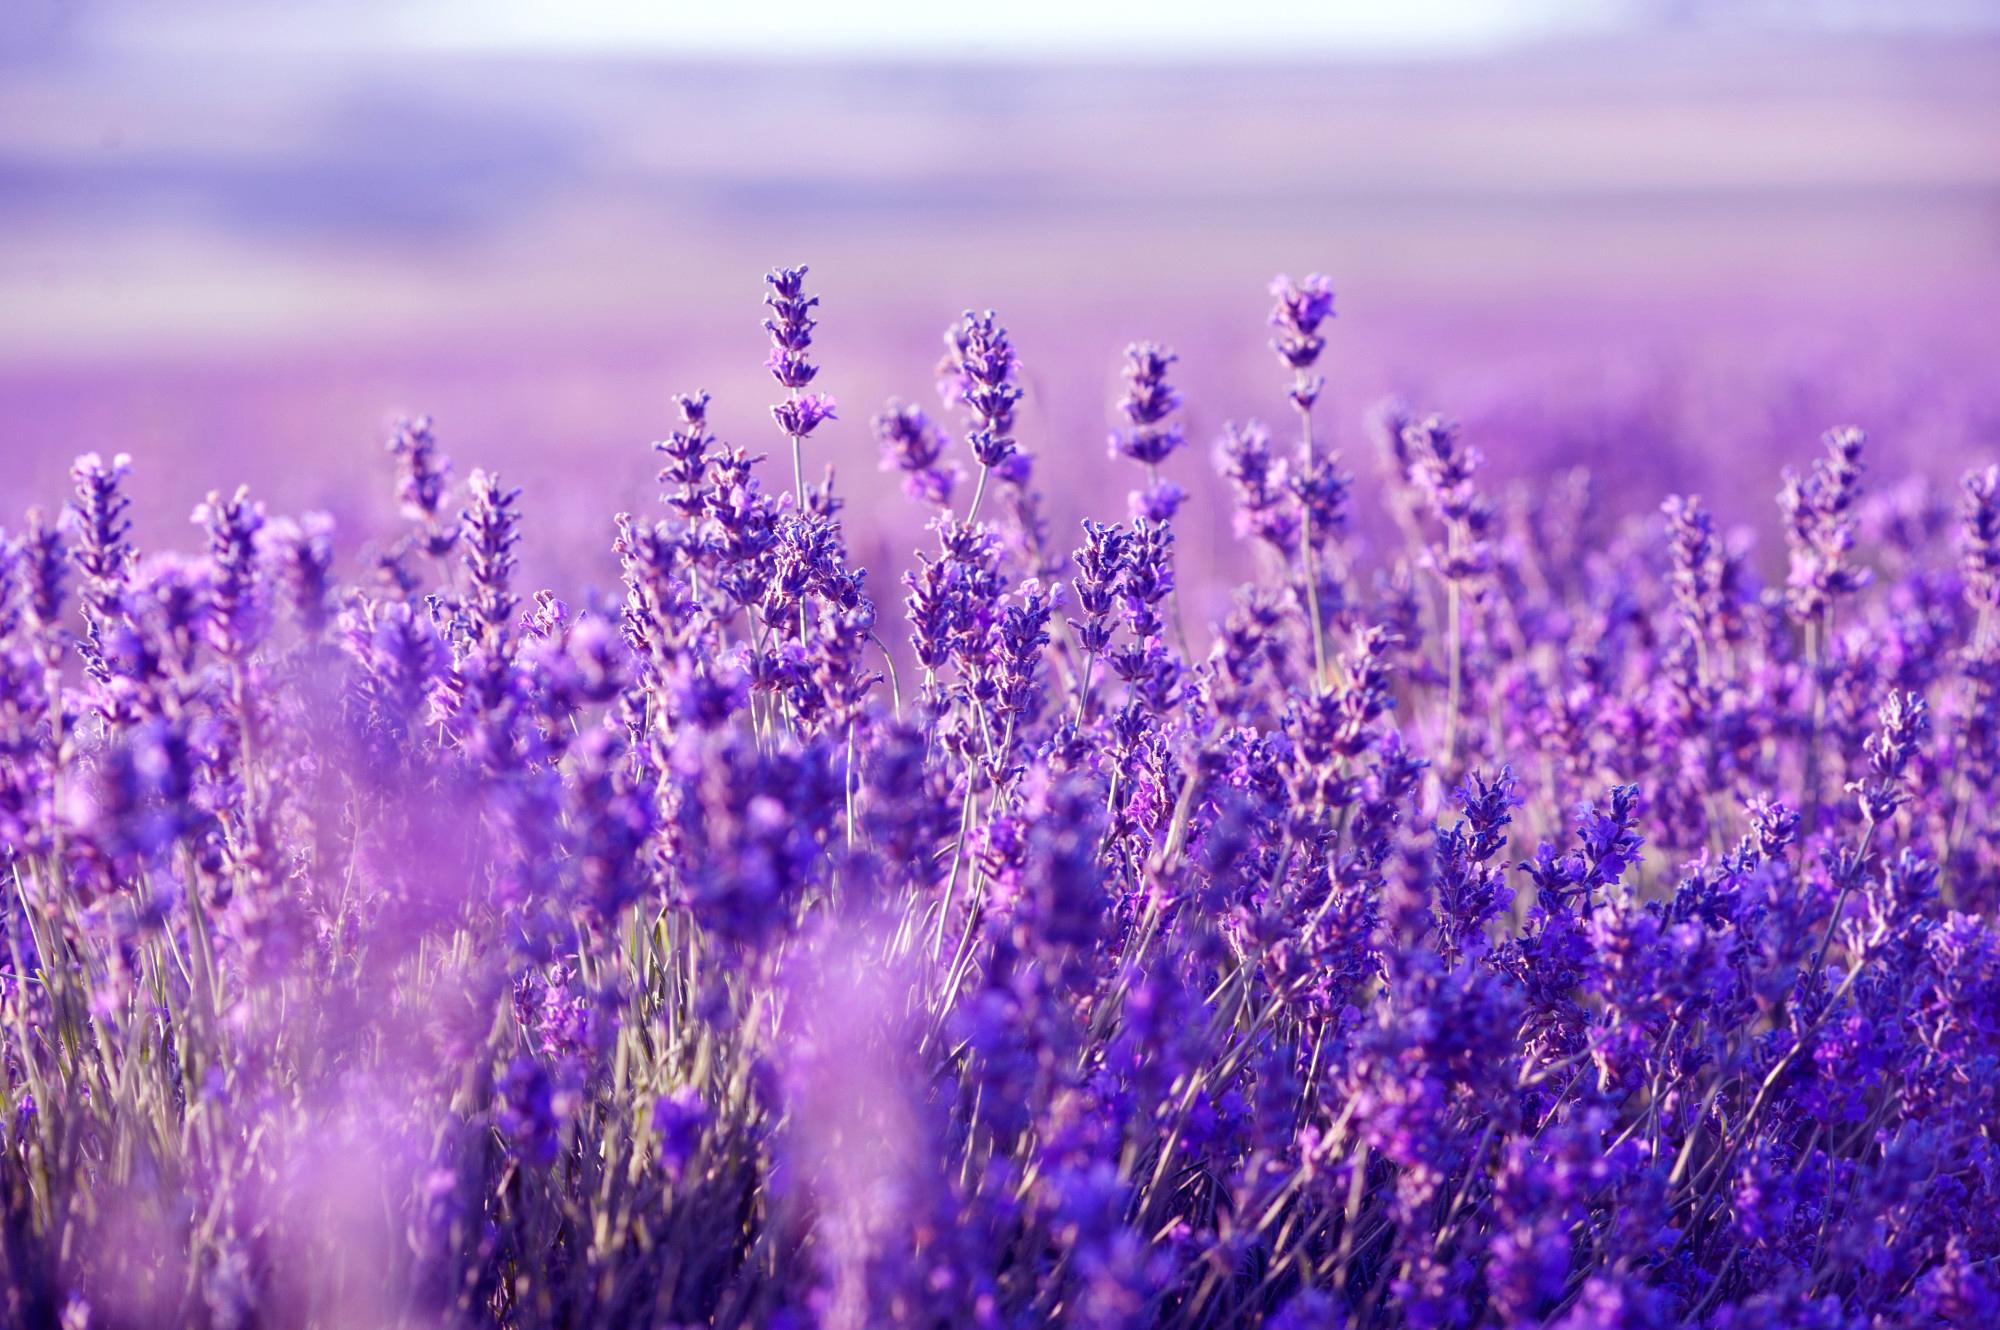 lavender background wallpaper - HD2000×1330